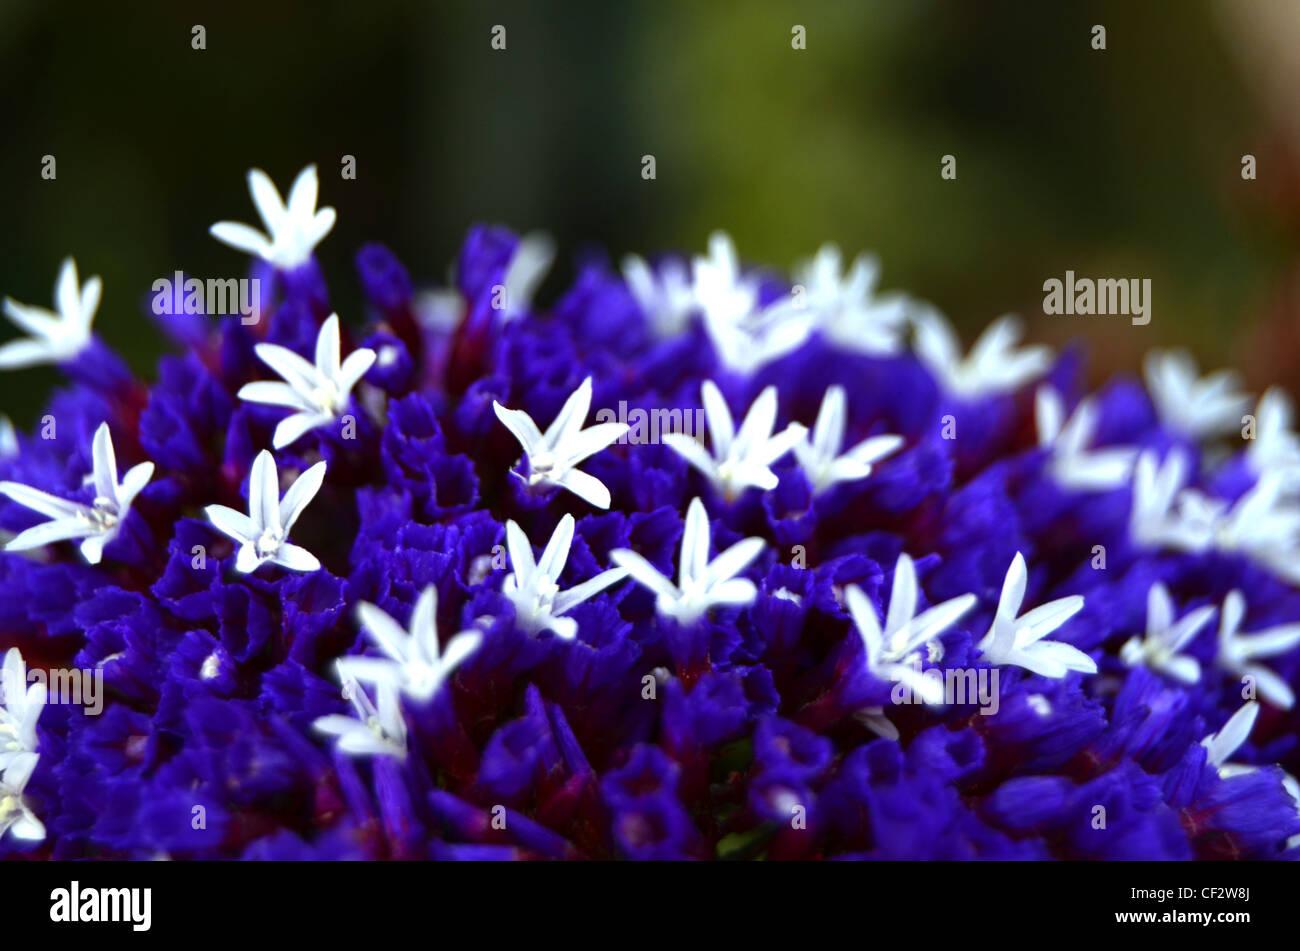 Macro surface of statice flower - Stock Image